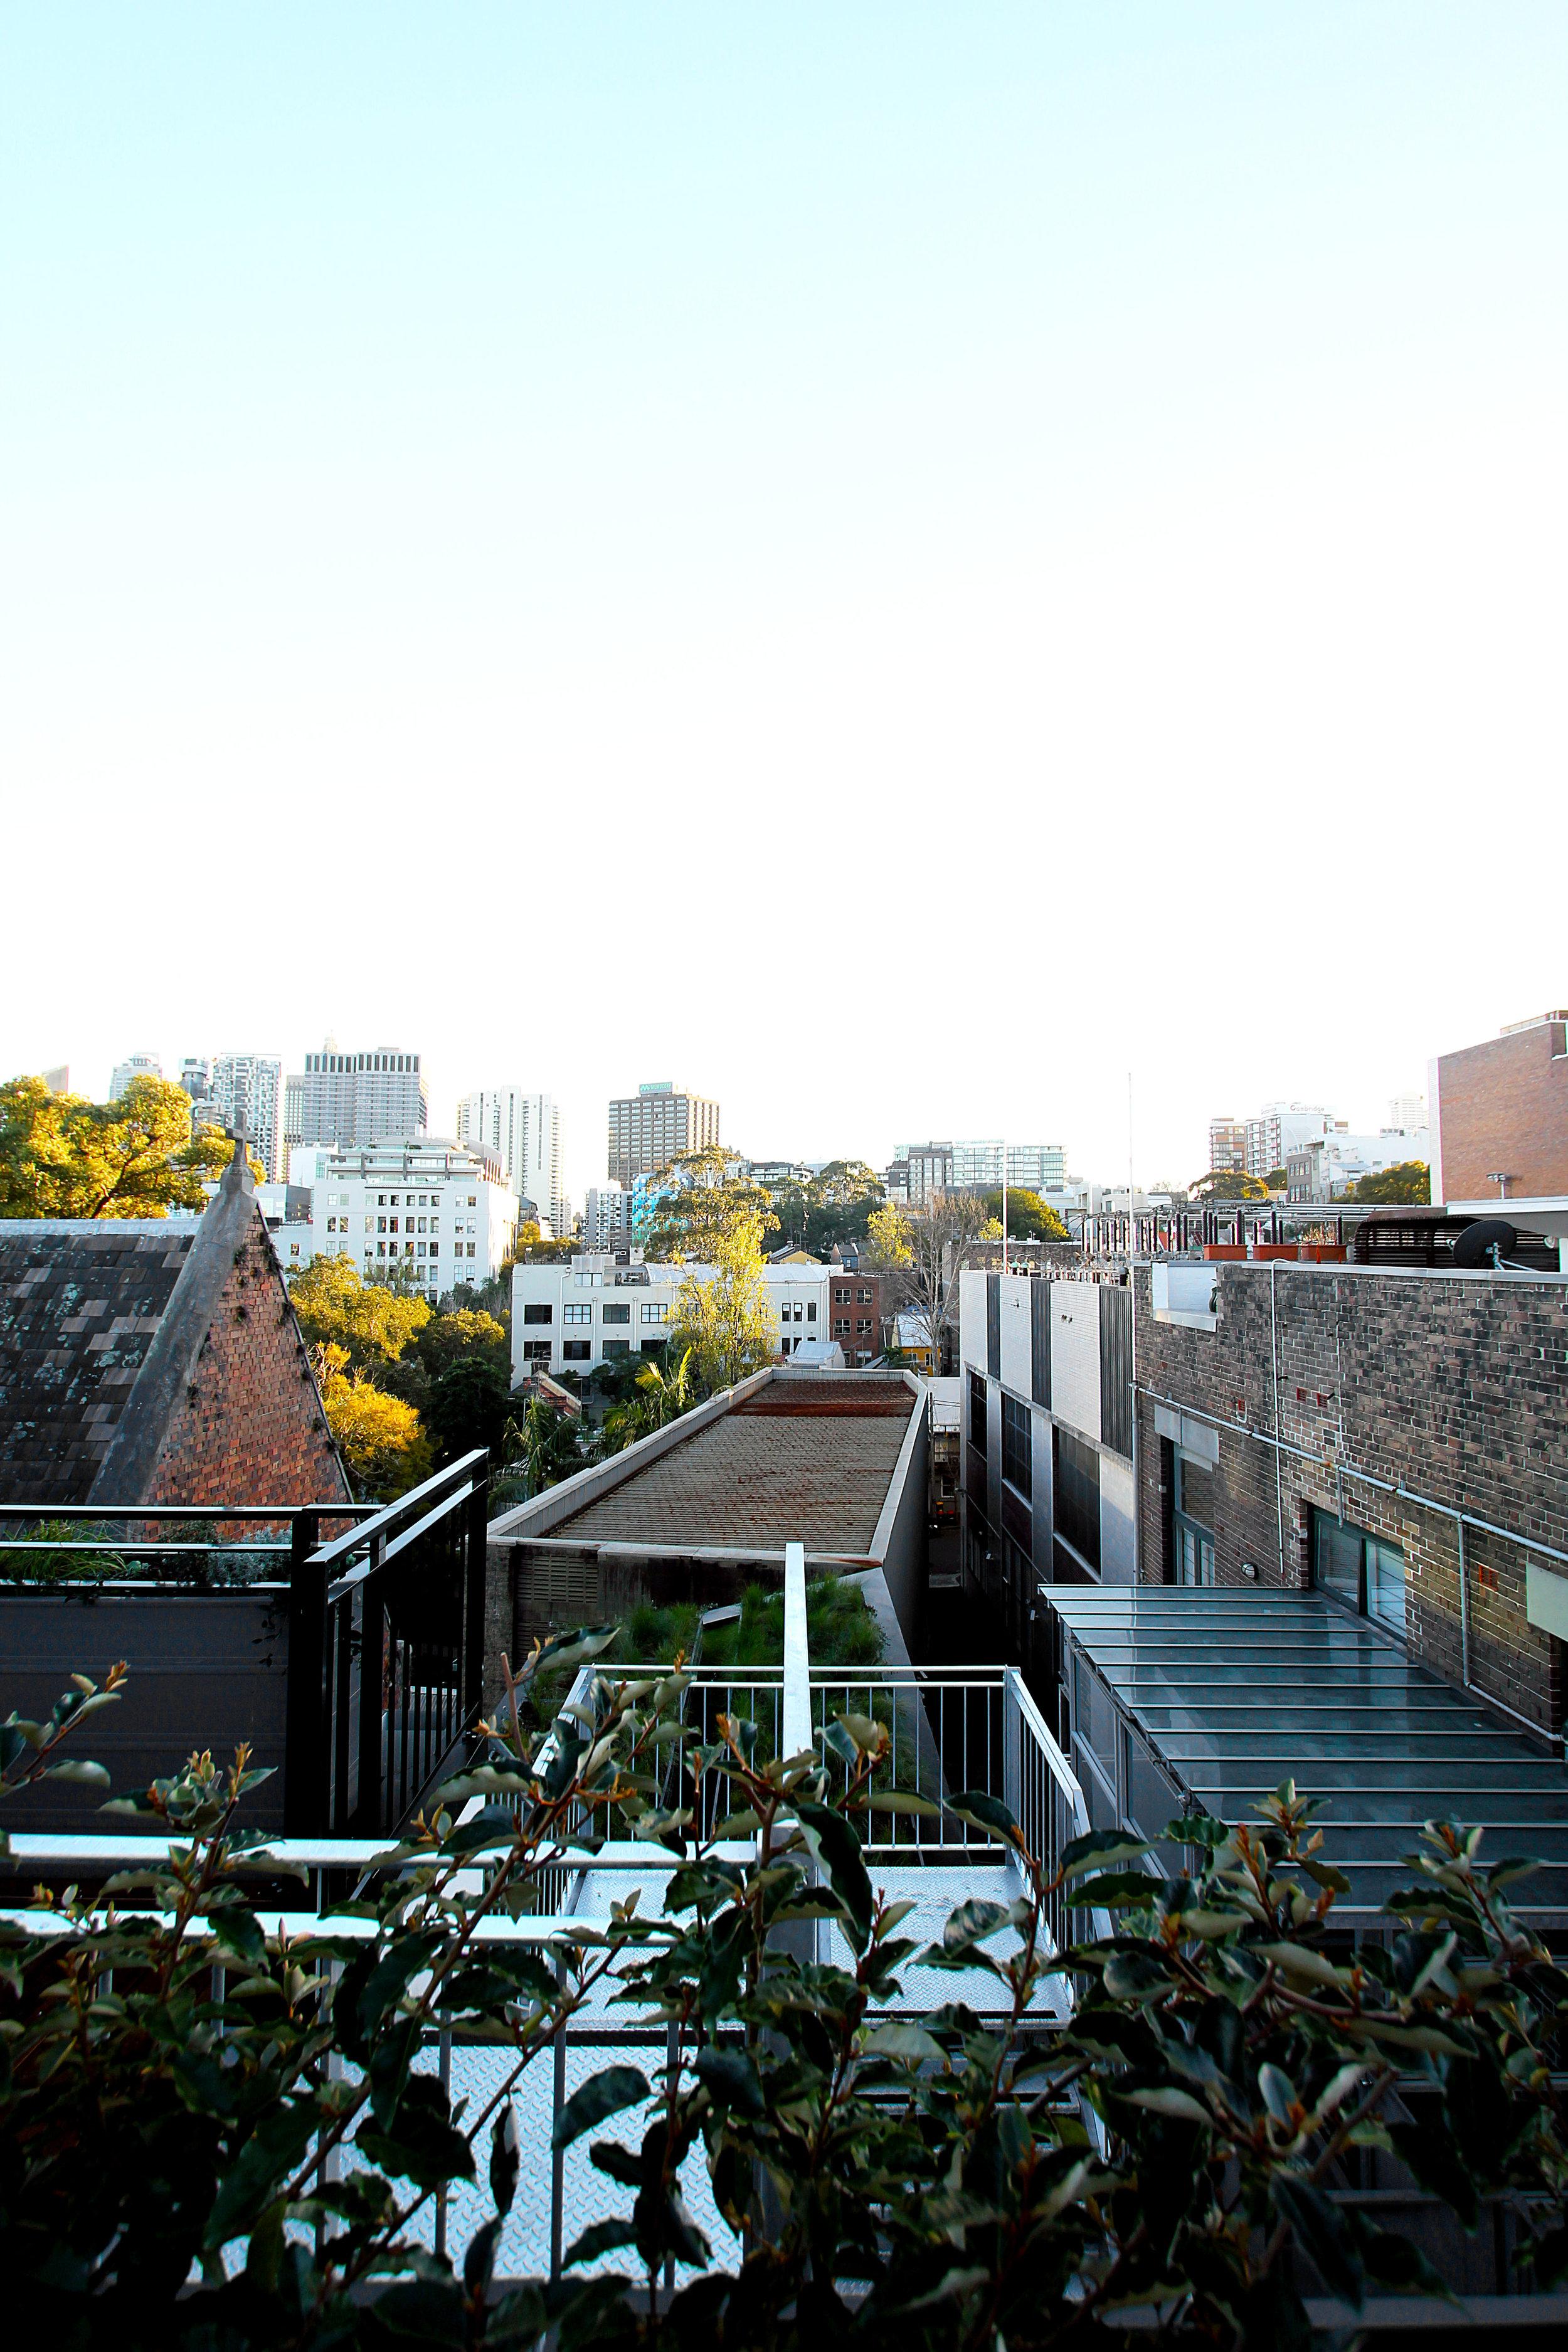 TYA Photography | Little Albion Guest House | Secret Rooftop Garden | Winter | Morning 02 | A9773.jpg